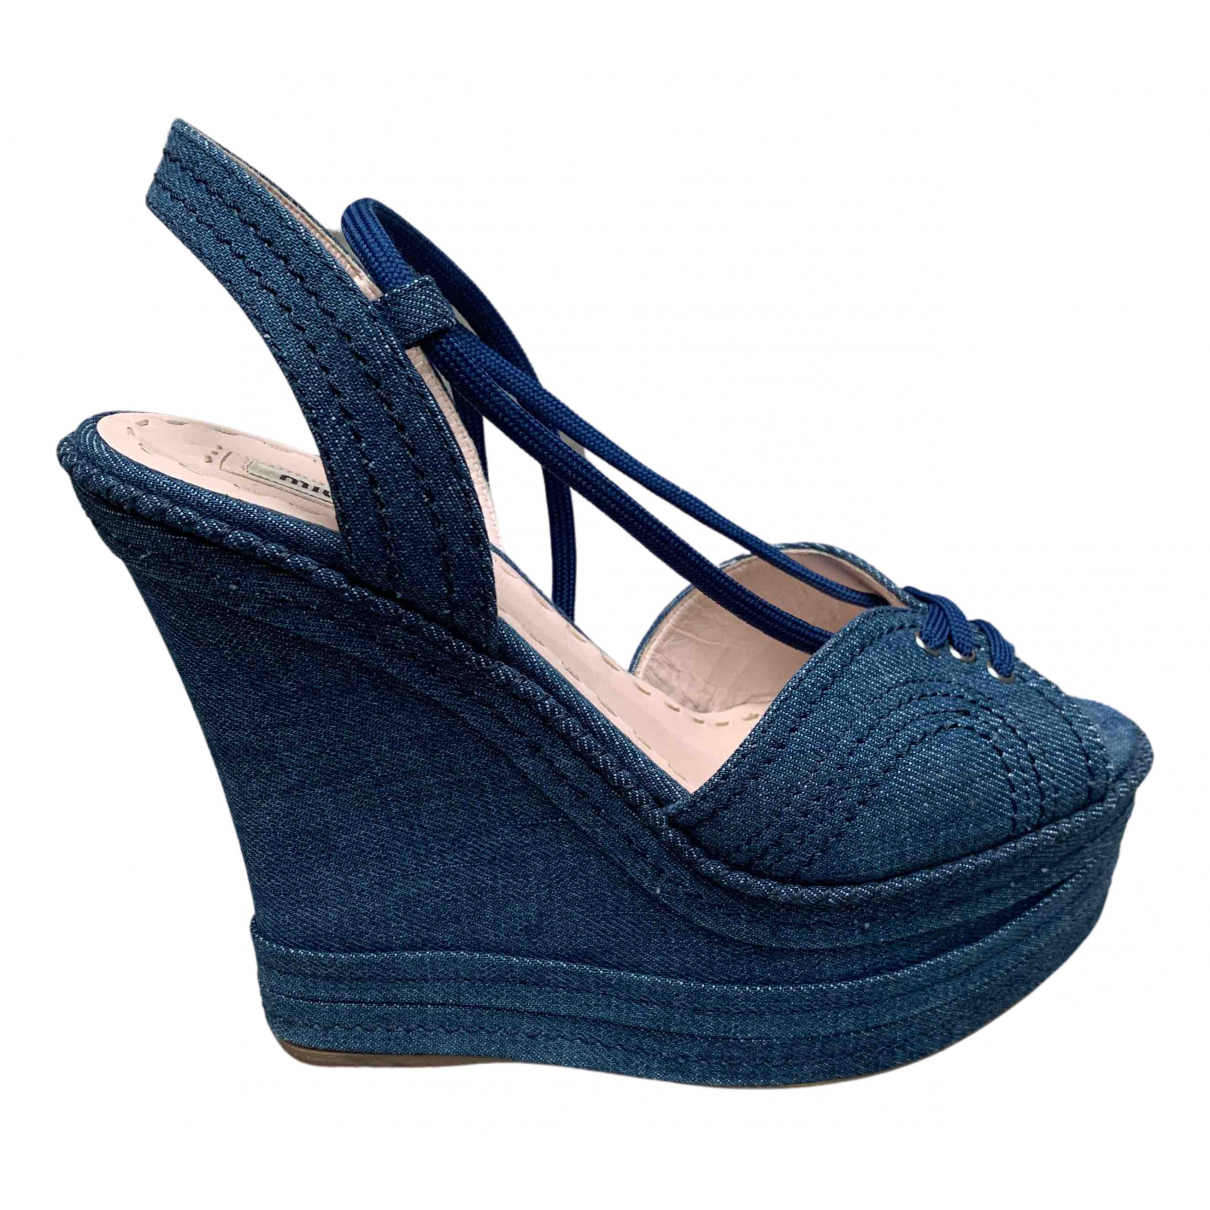 Miu Miu - Sandales   pour femme en toile - bleu